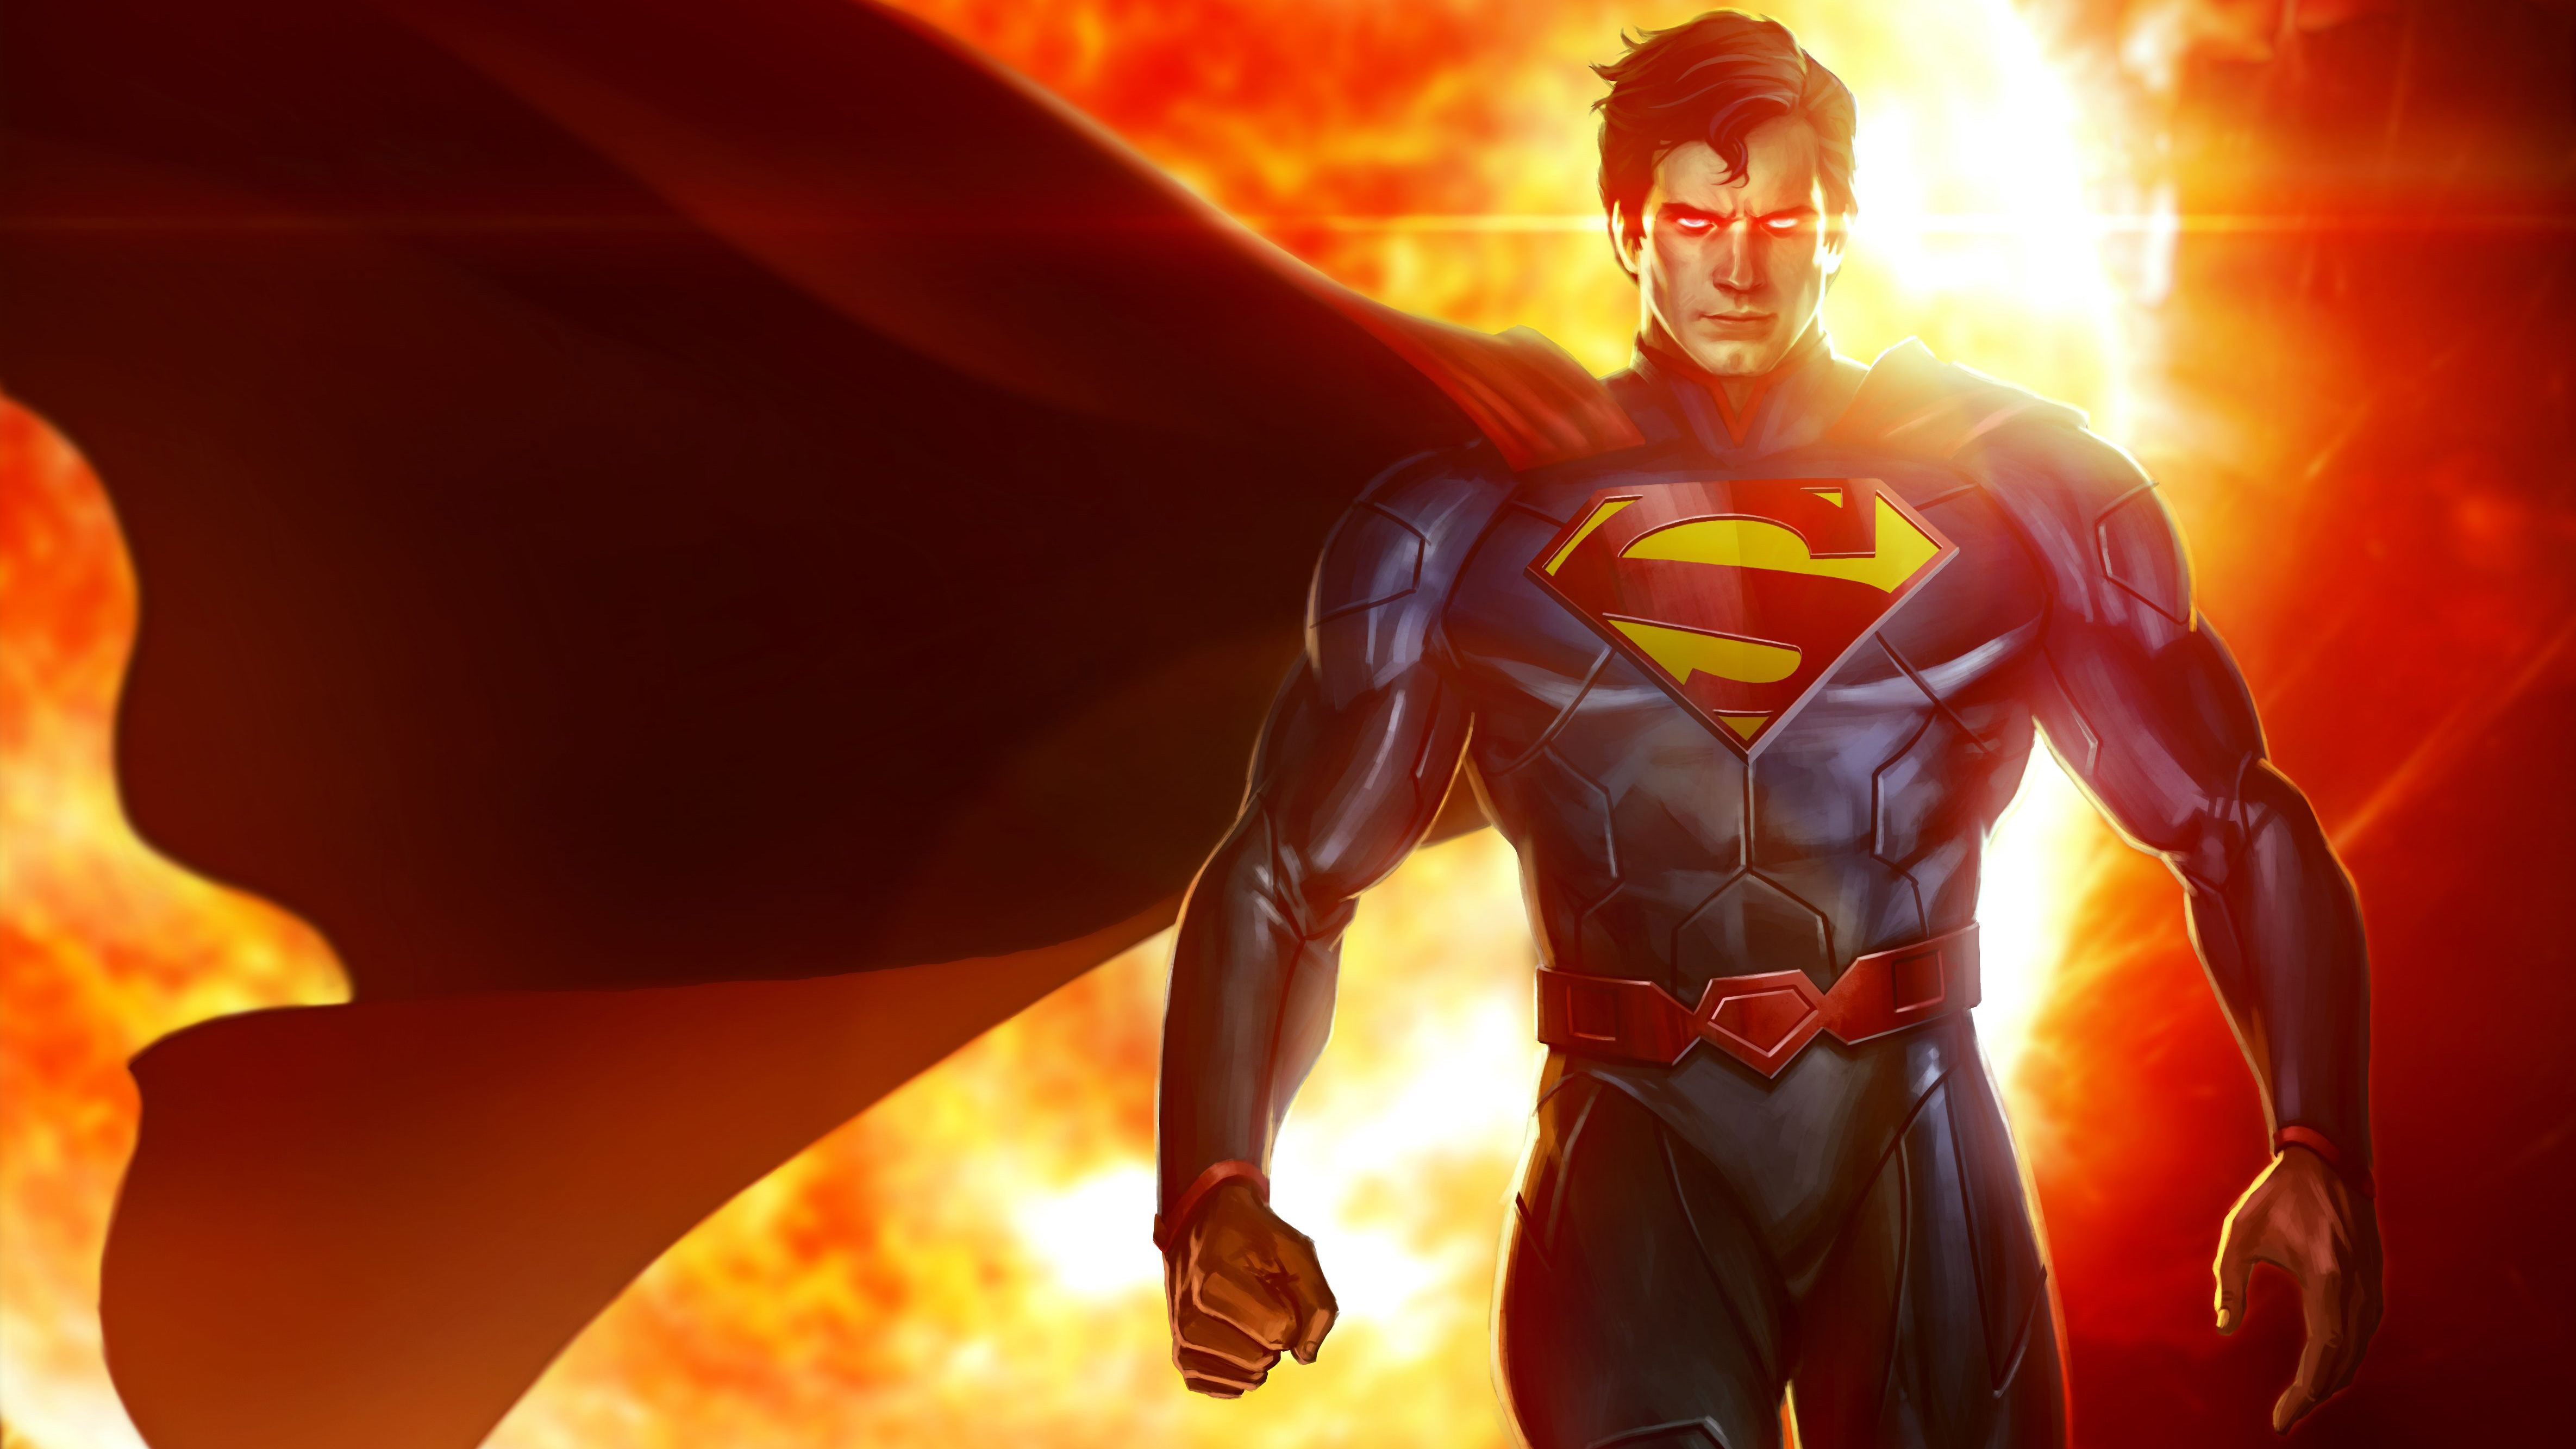 Superman Hd Fond D Ecran 4k Superman Hd Fond D Ecran 4740x2666 Wallpapertip